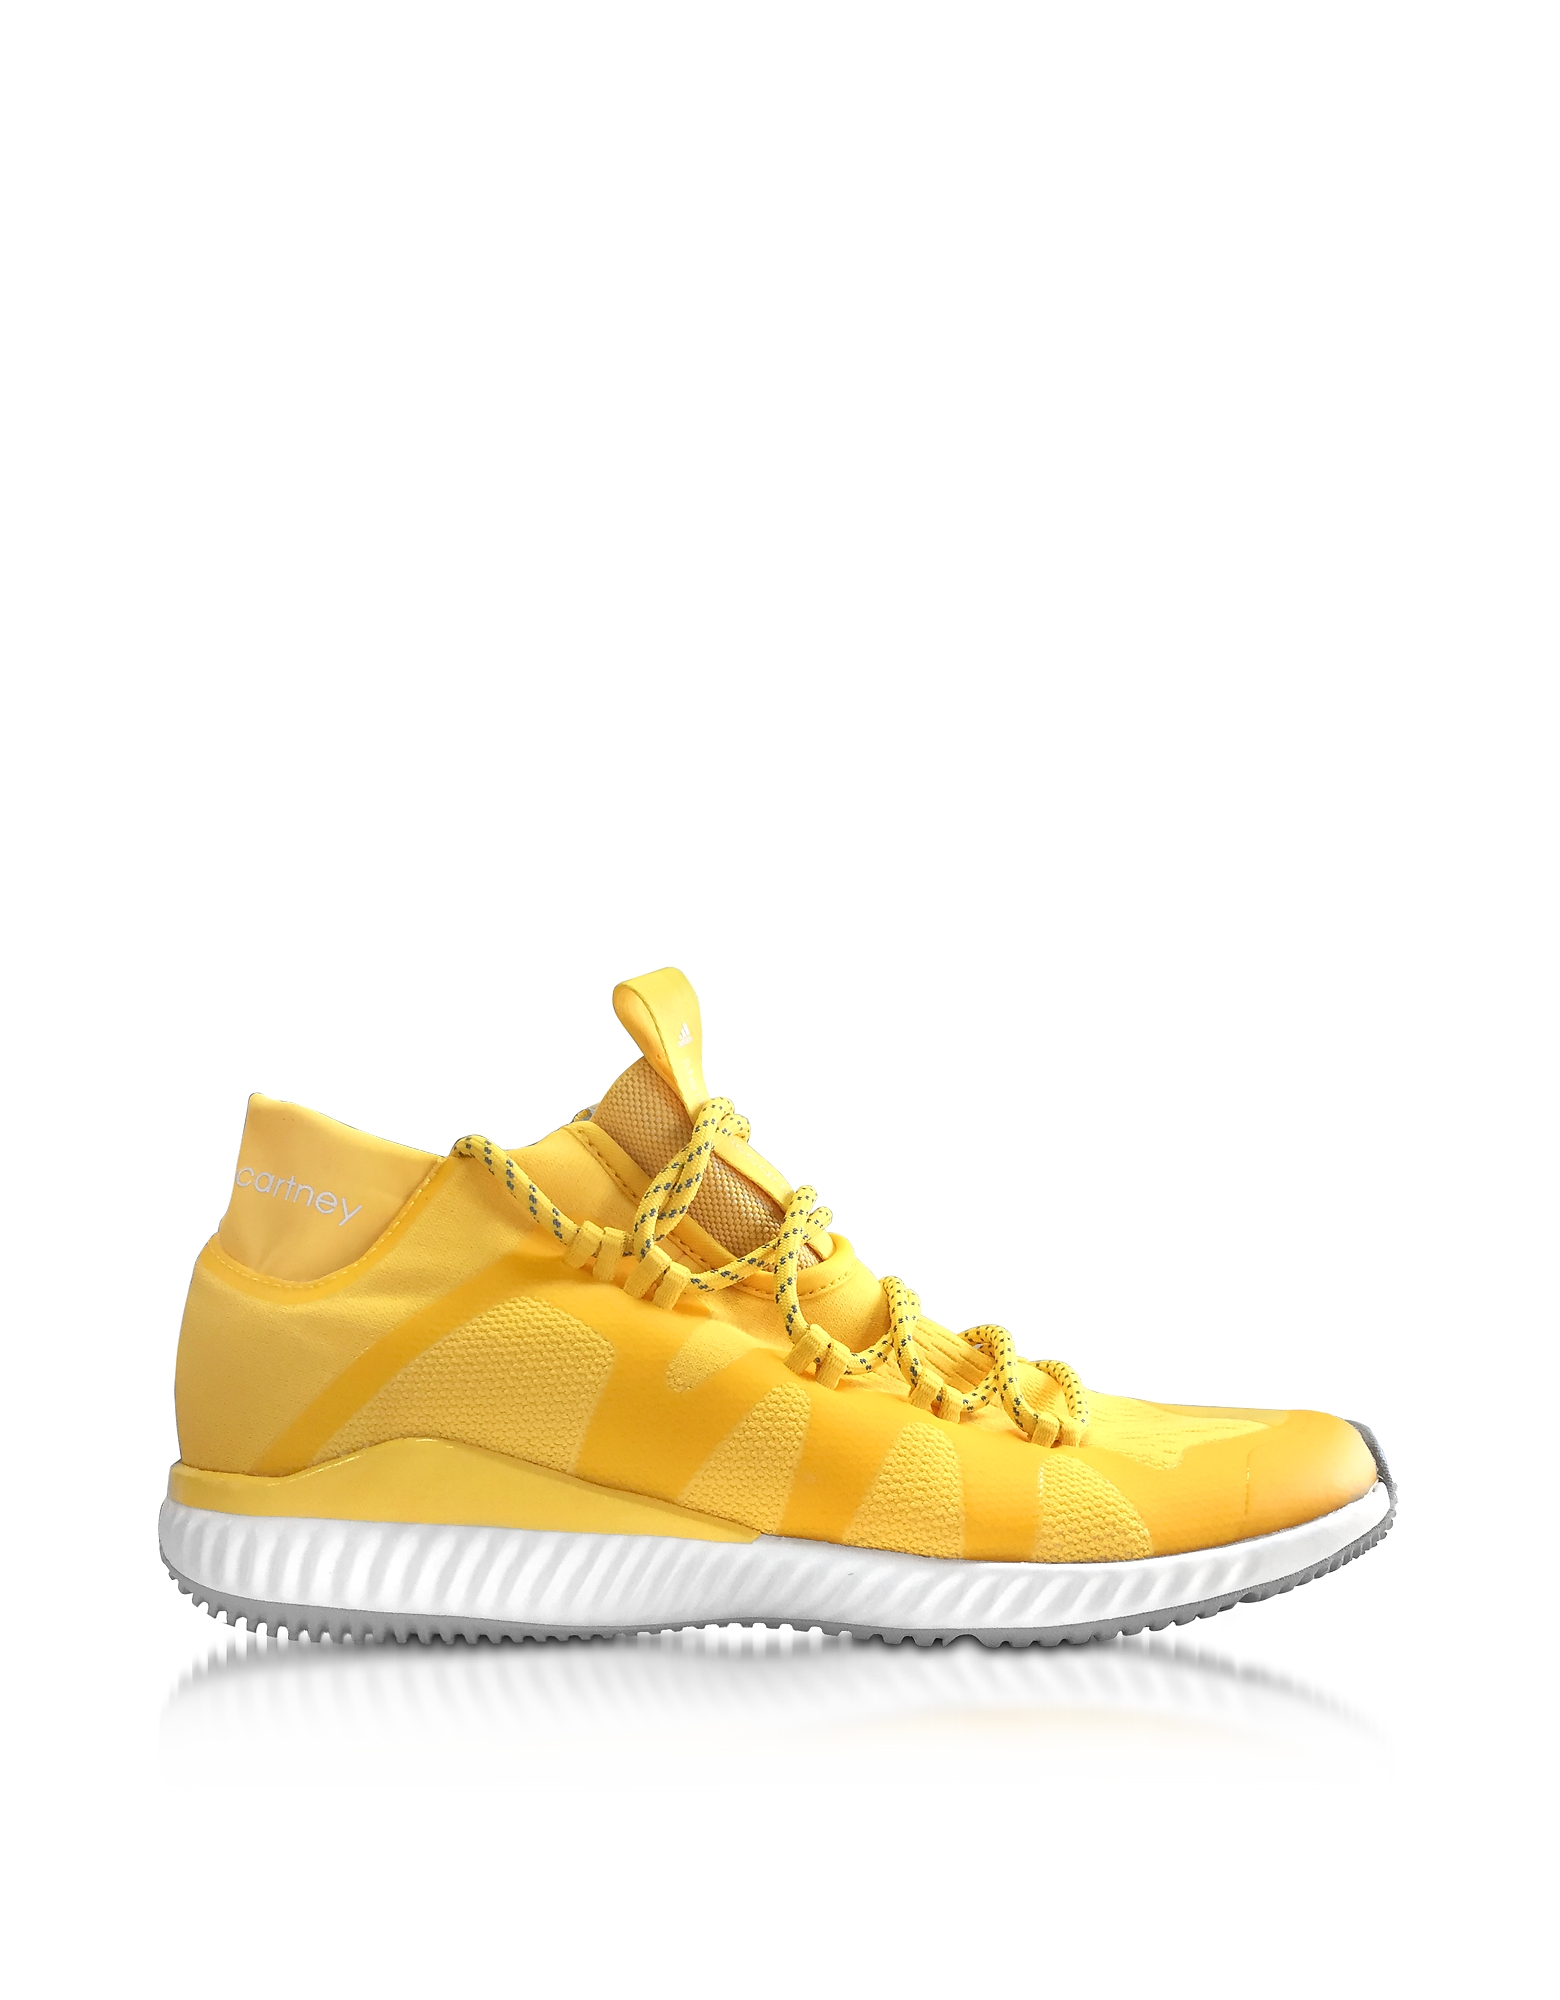 Adidas Stella McCartney Wonder Glow Crazymove Bounce - Женские Кеды